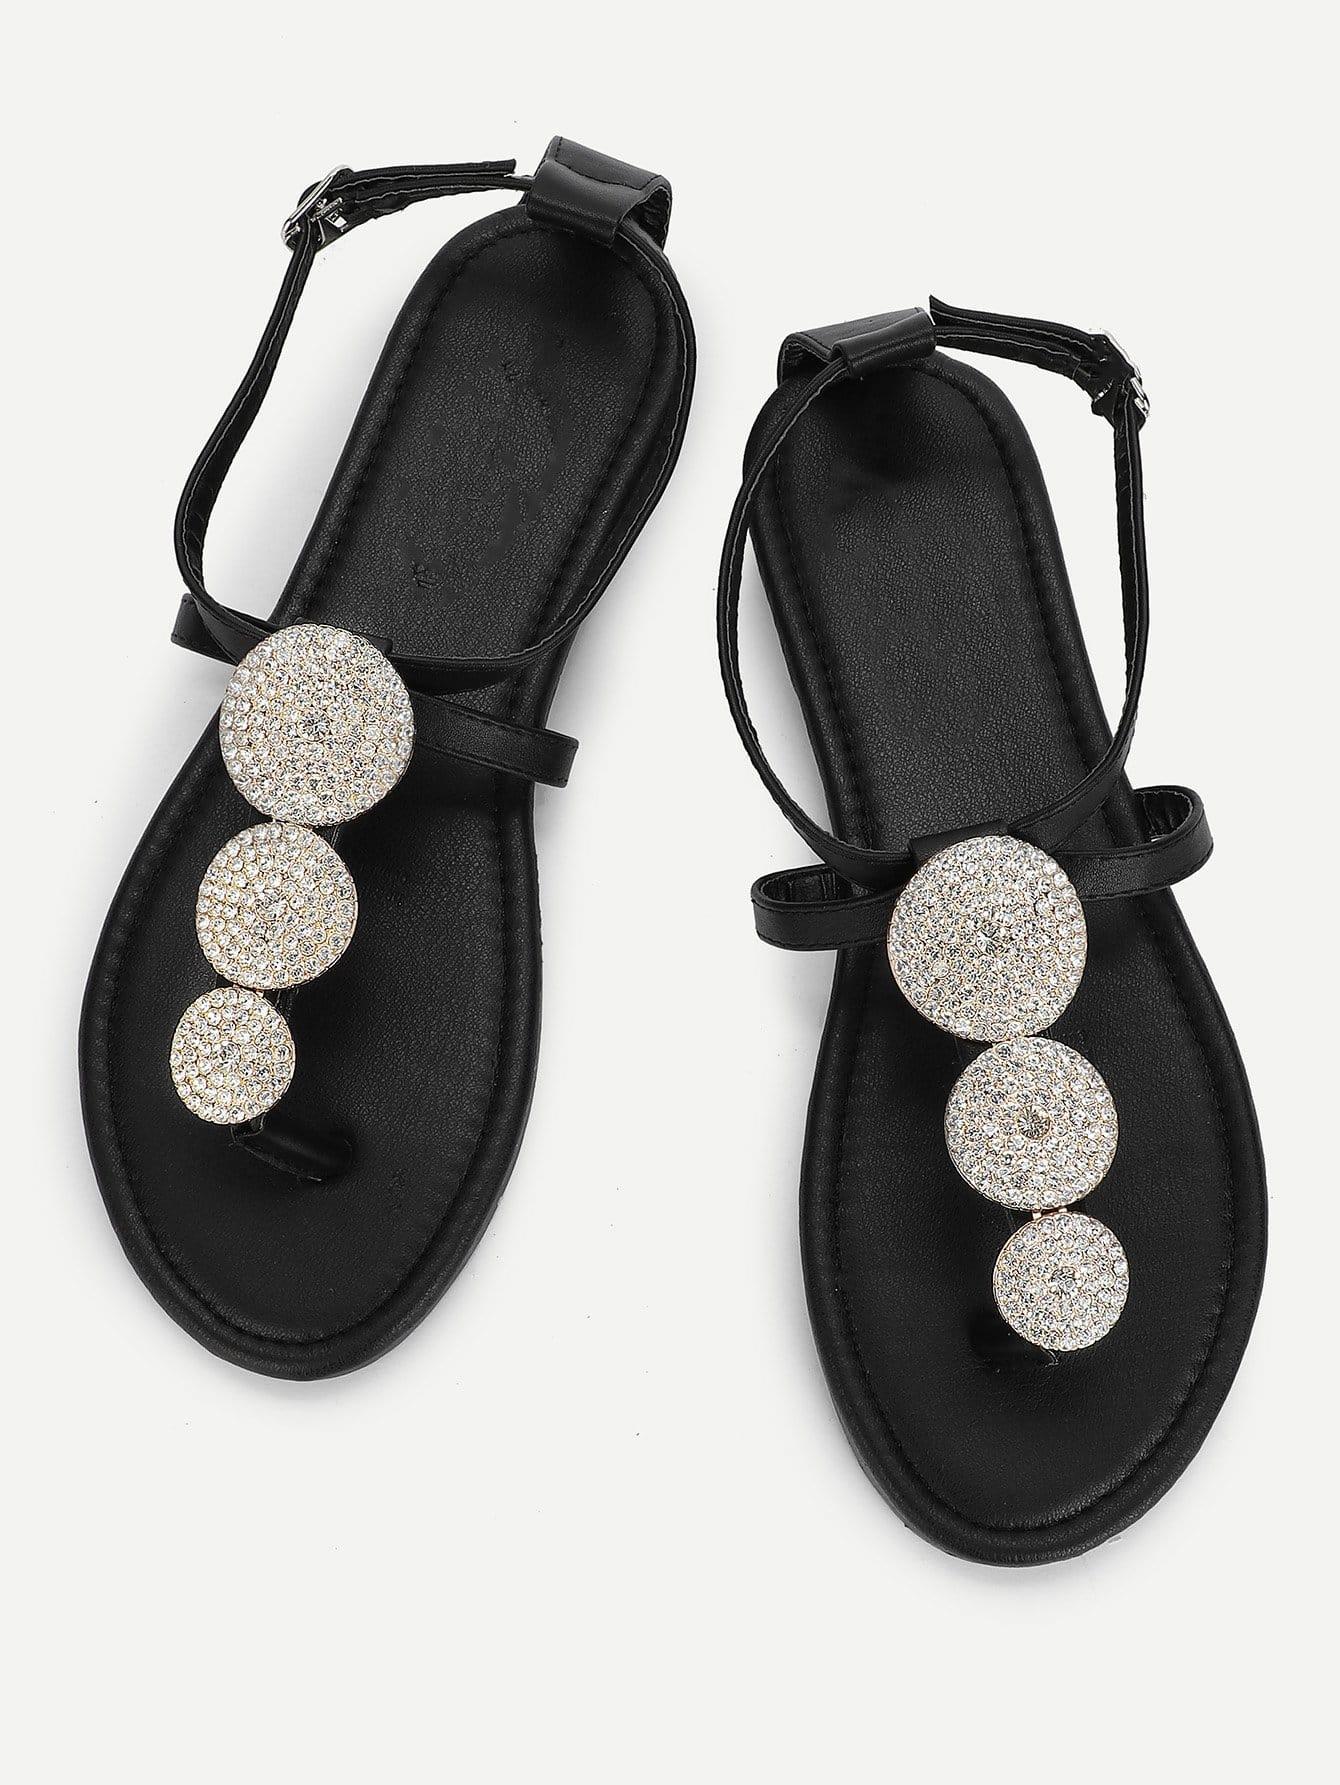 Rhinestone Toe Post Sandals rhinestone design toe post sandals